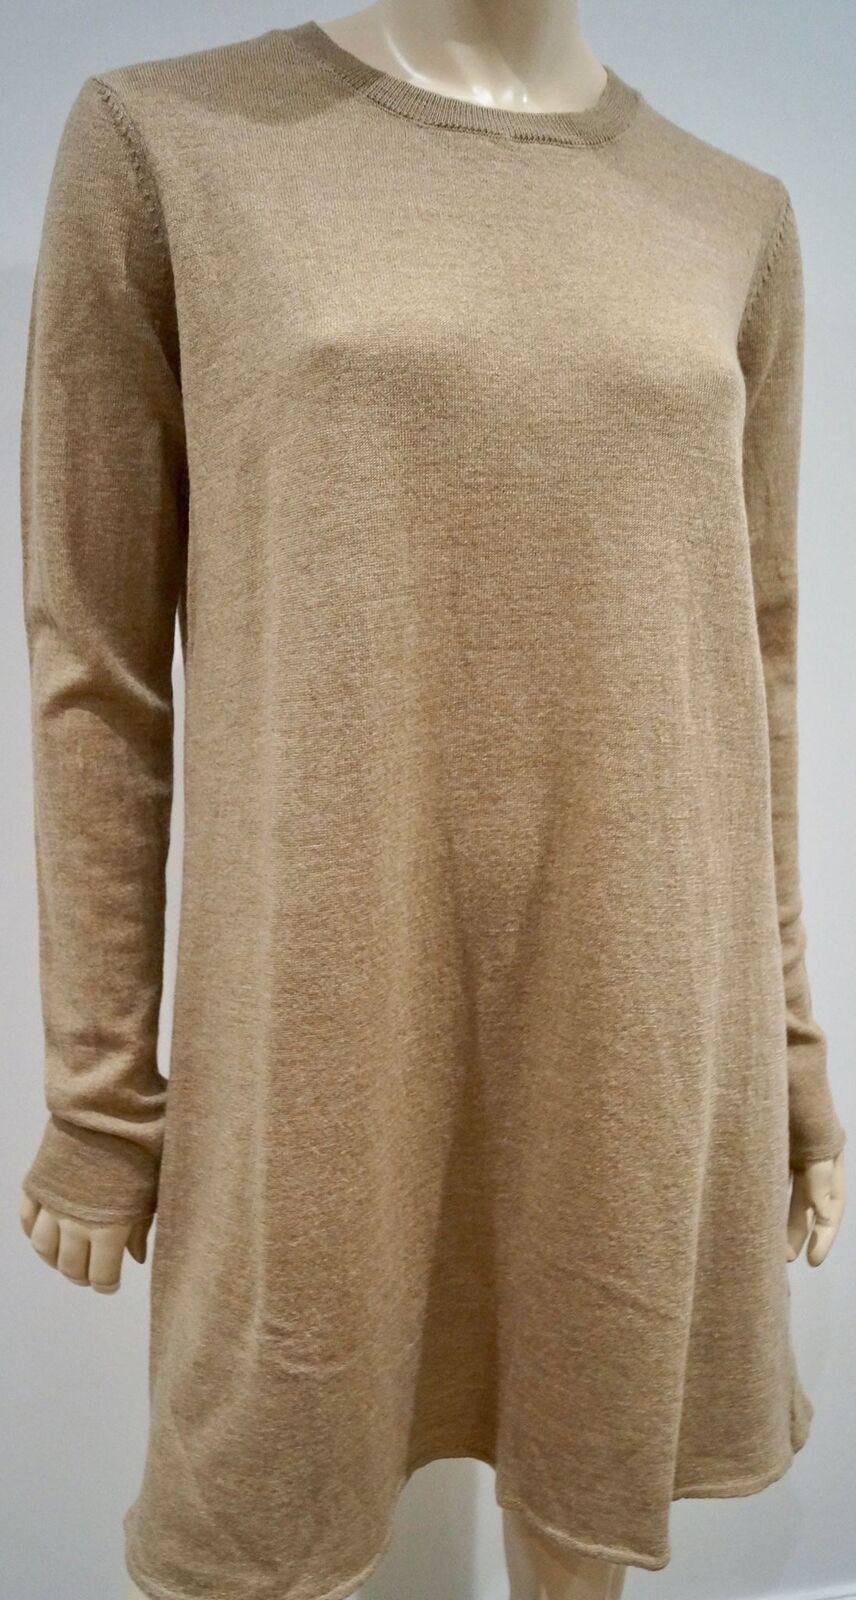 AMERICAN VINTAGE Womens Caramel Beige 100% Wool Short Length Jumper Dress M BNWT